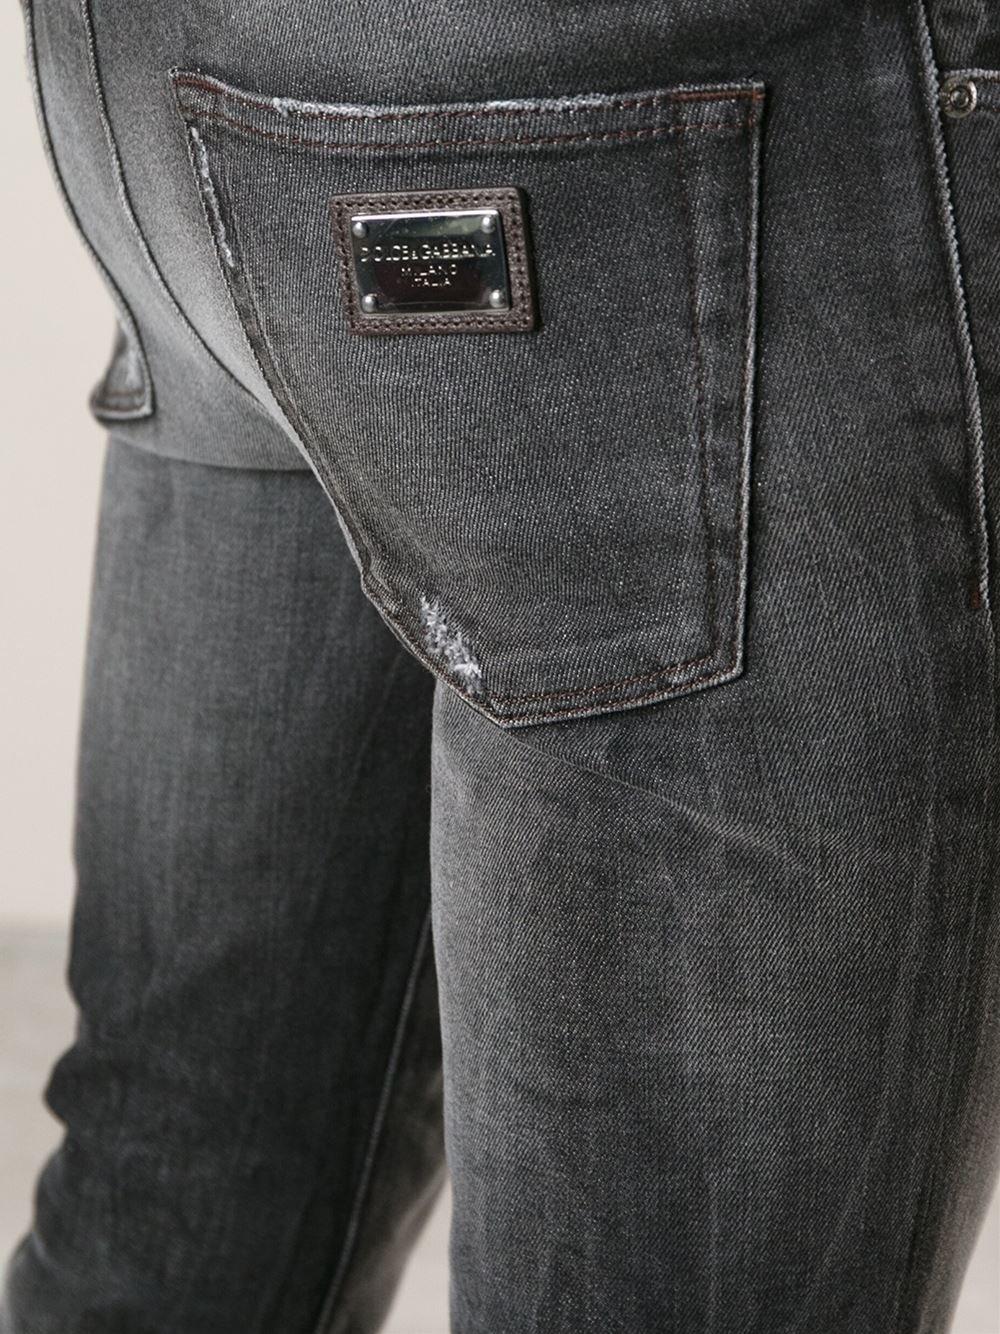 dolce gabbana distressed skinny jeans in gray for men lyst. Black Bedroom Furniture Sets. Home Design Ideas